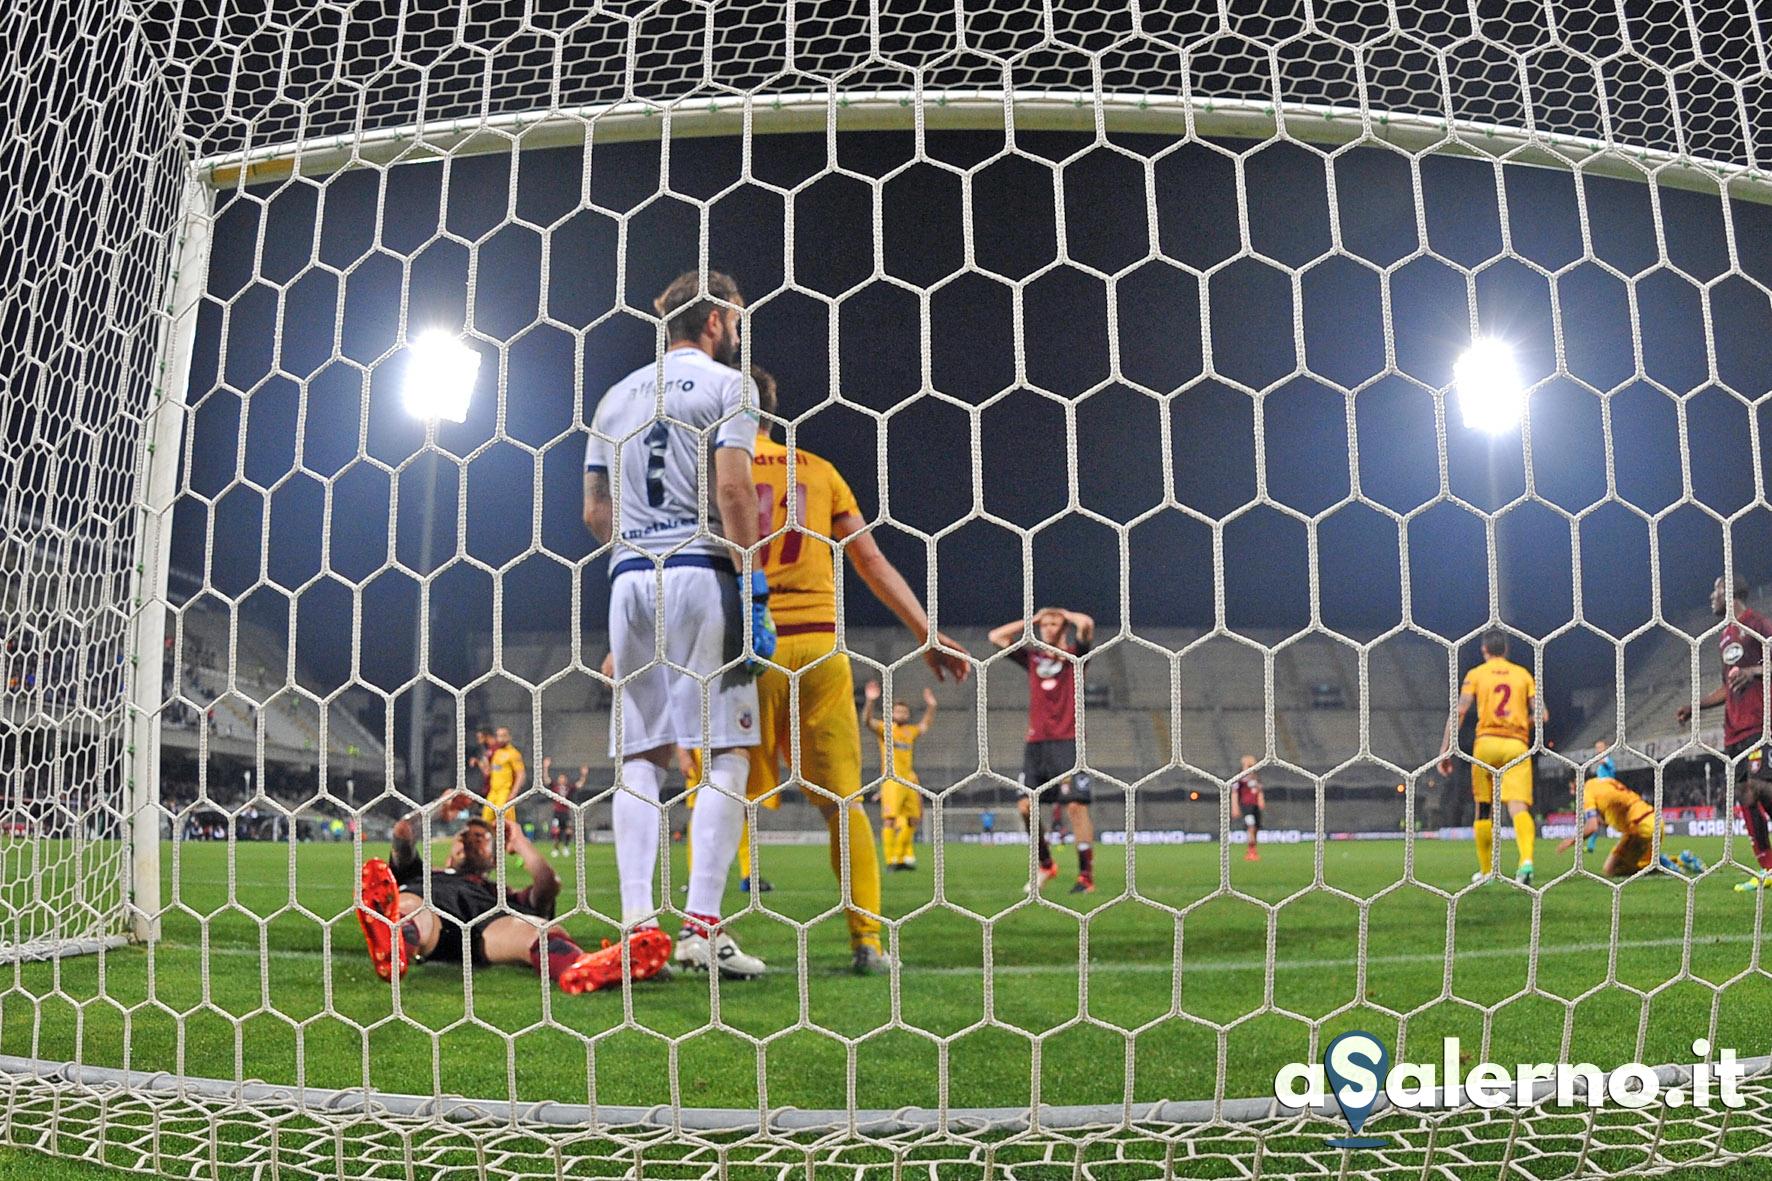 Salerno. Salernitana - Cittadella campionato serie B 2016/2017